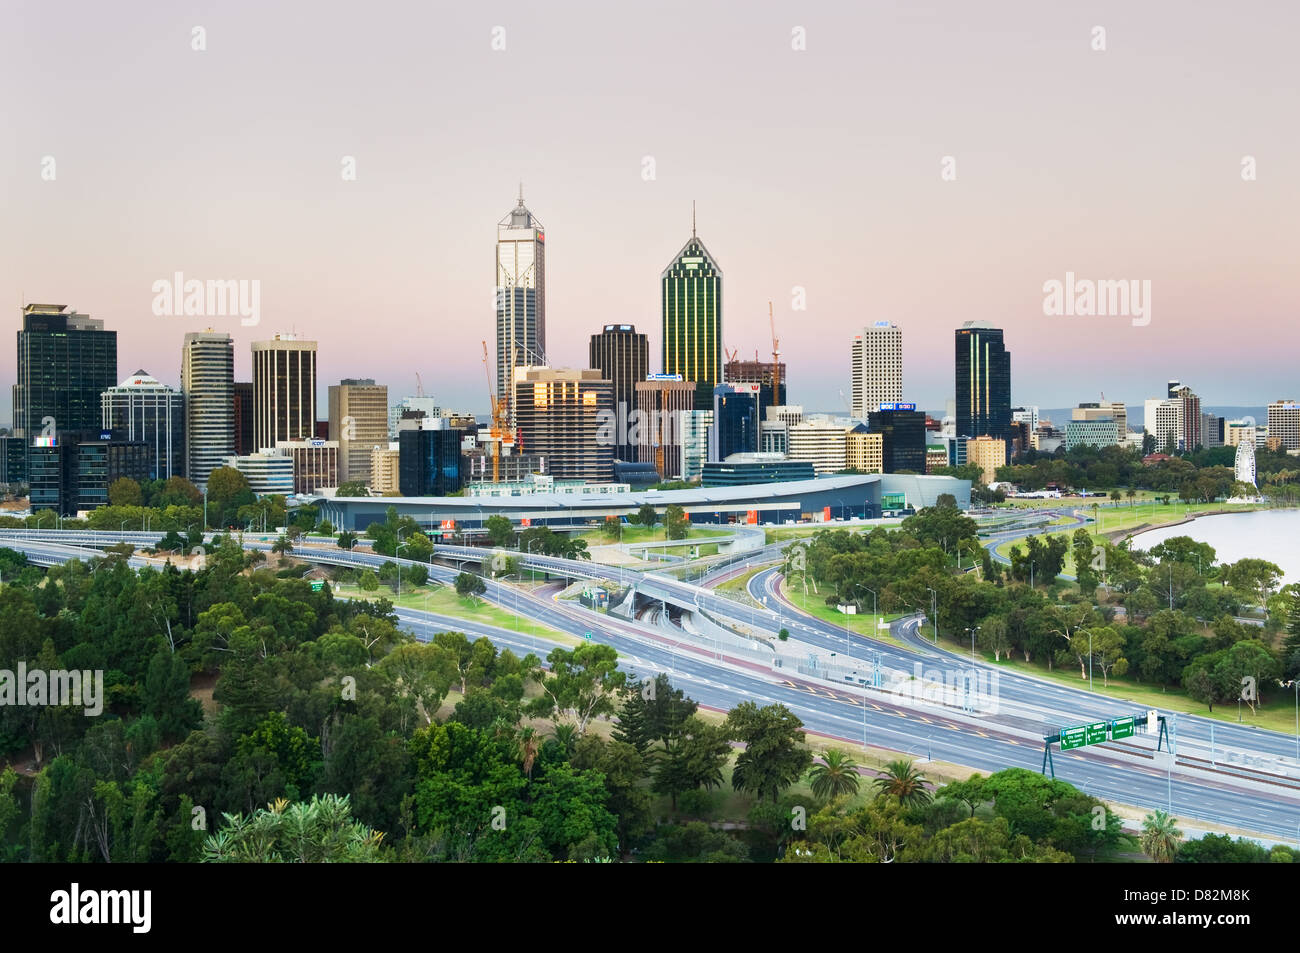 Perth City Centre at dusk. - Stock Image